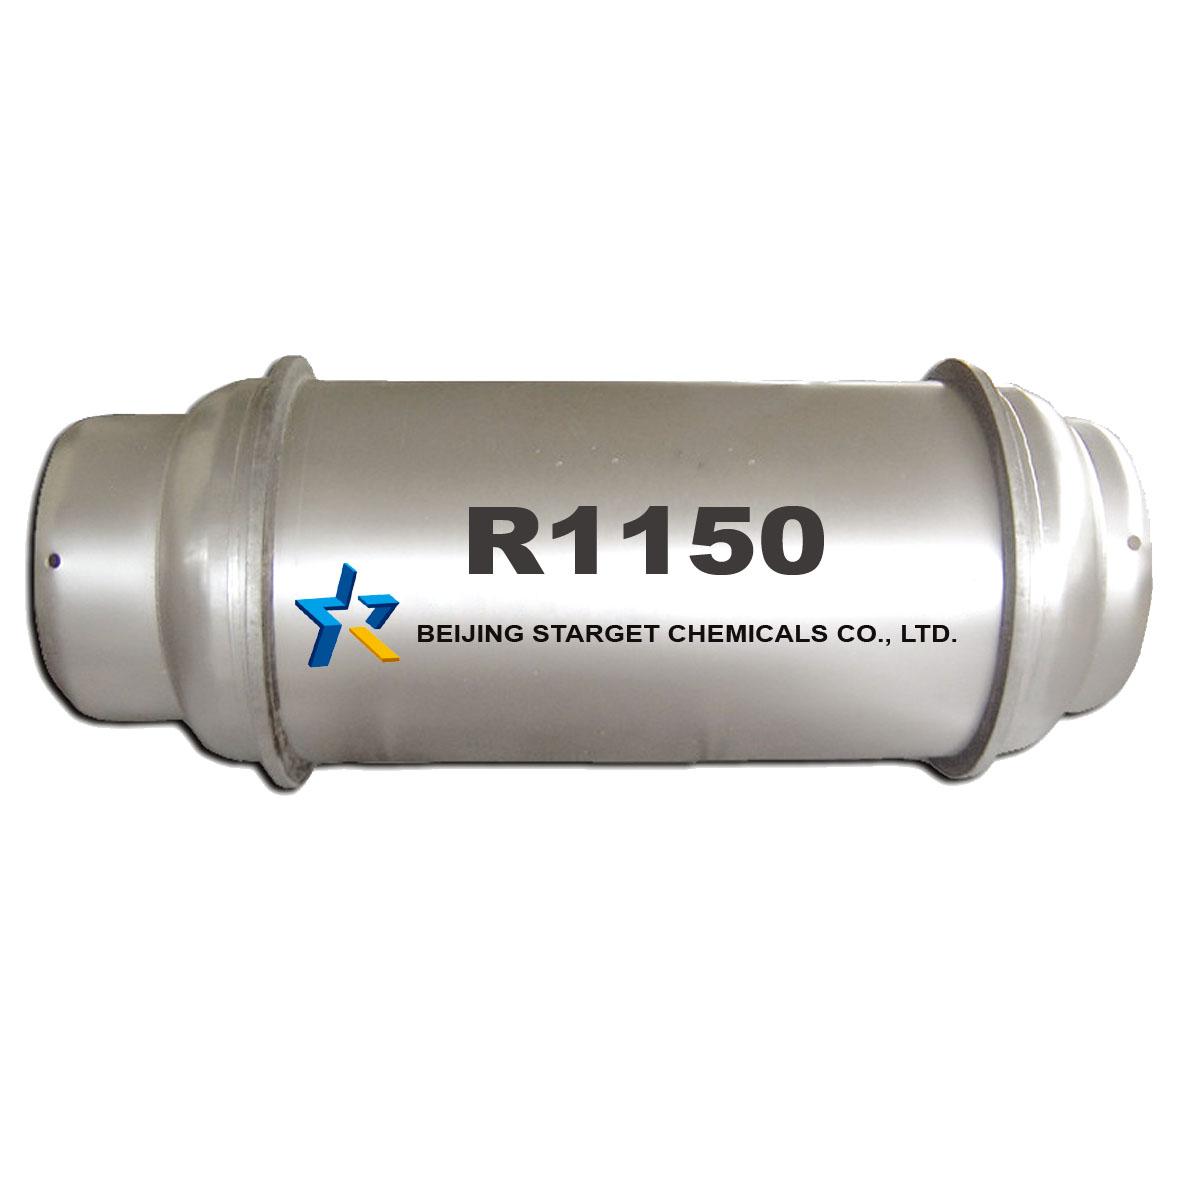 Refrigerant R1150